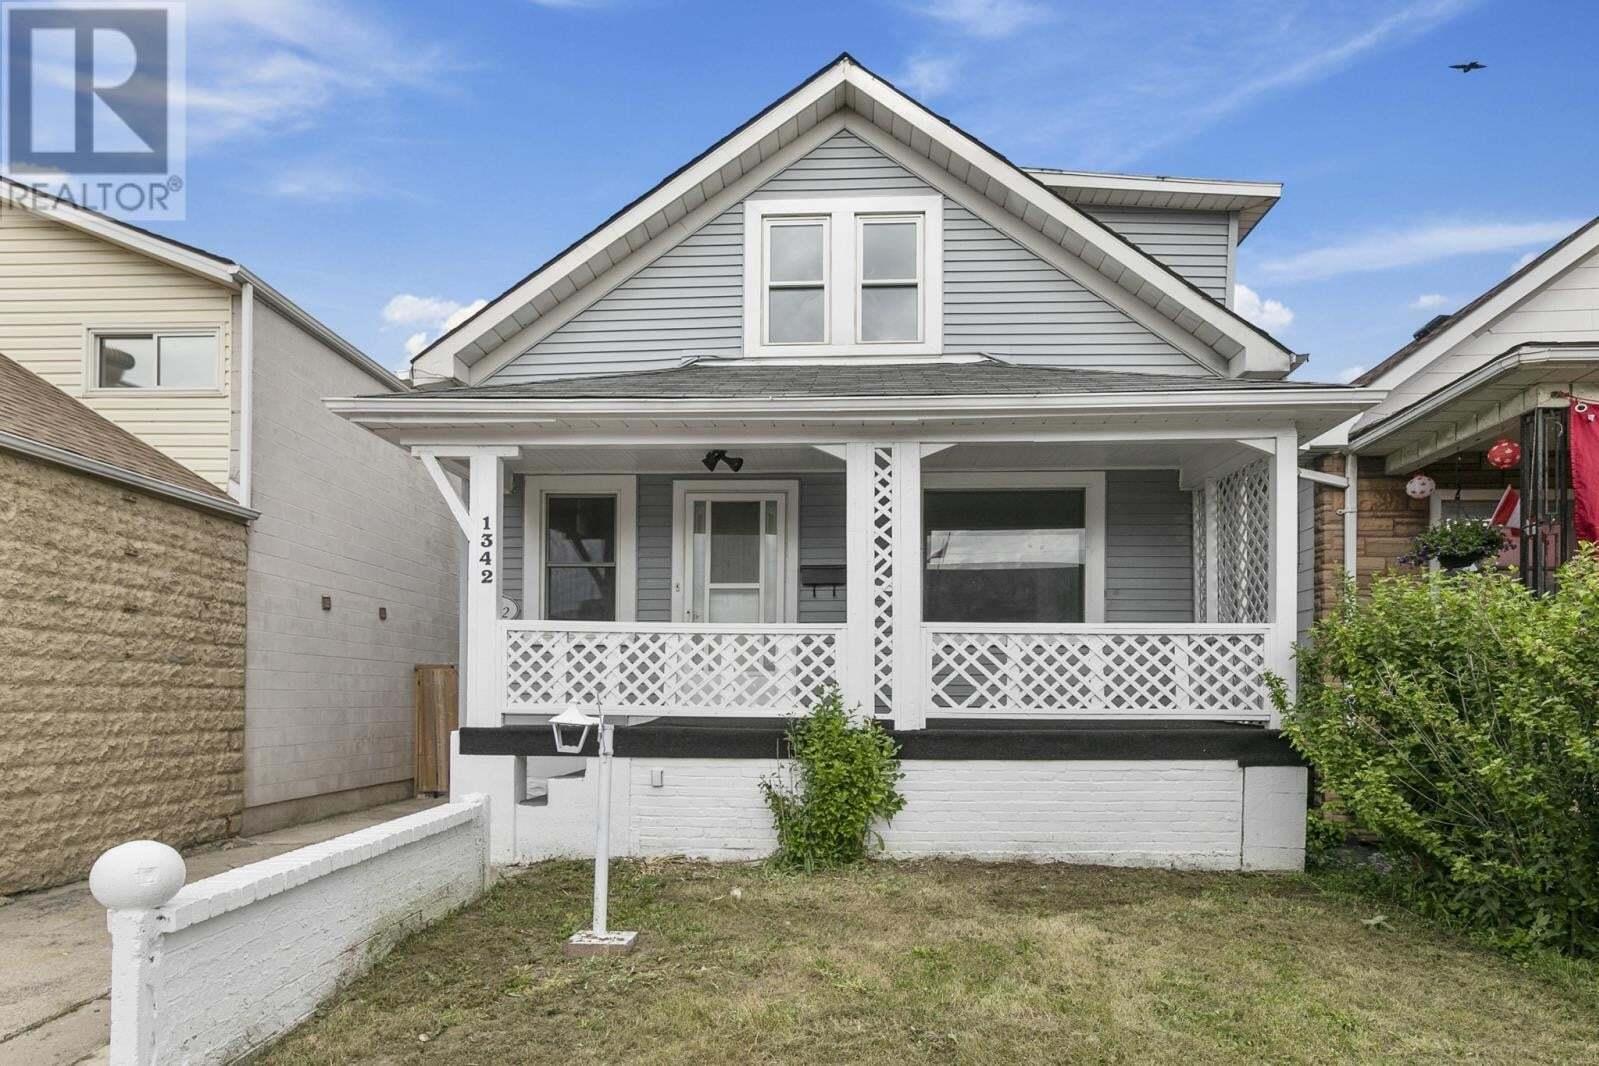 House for sale at 1342 Drouillard  Windsor Ontario - MLS: 20007859